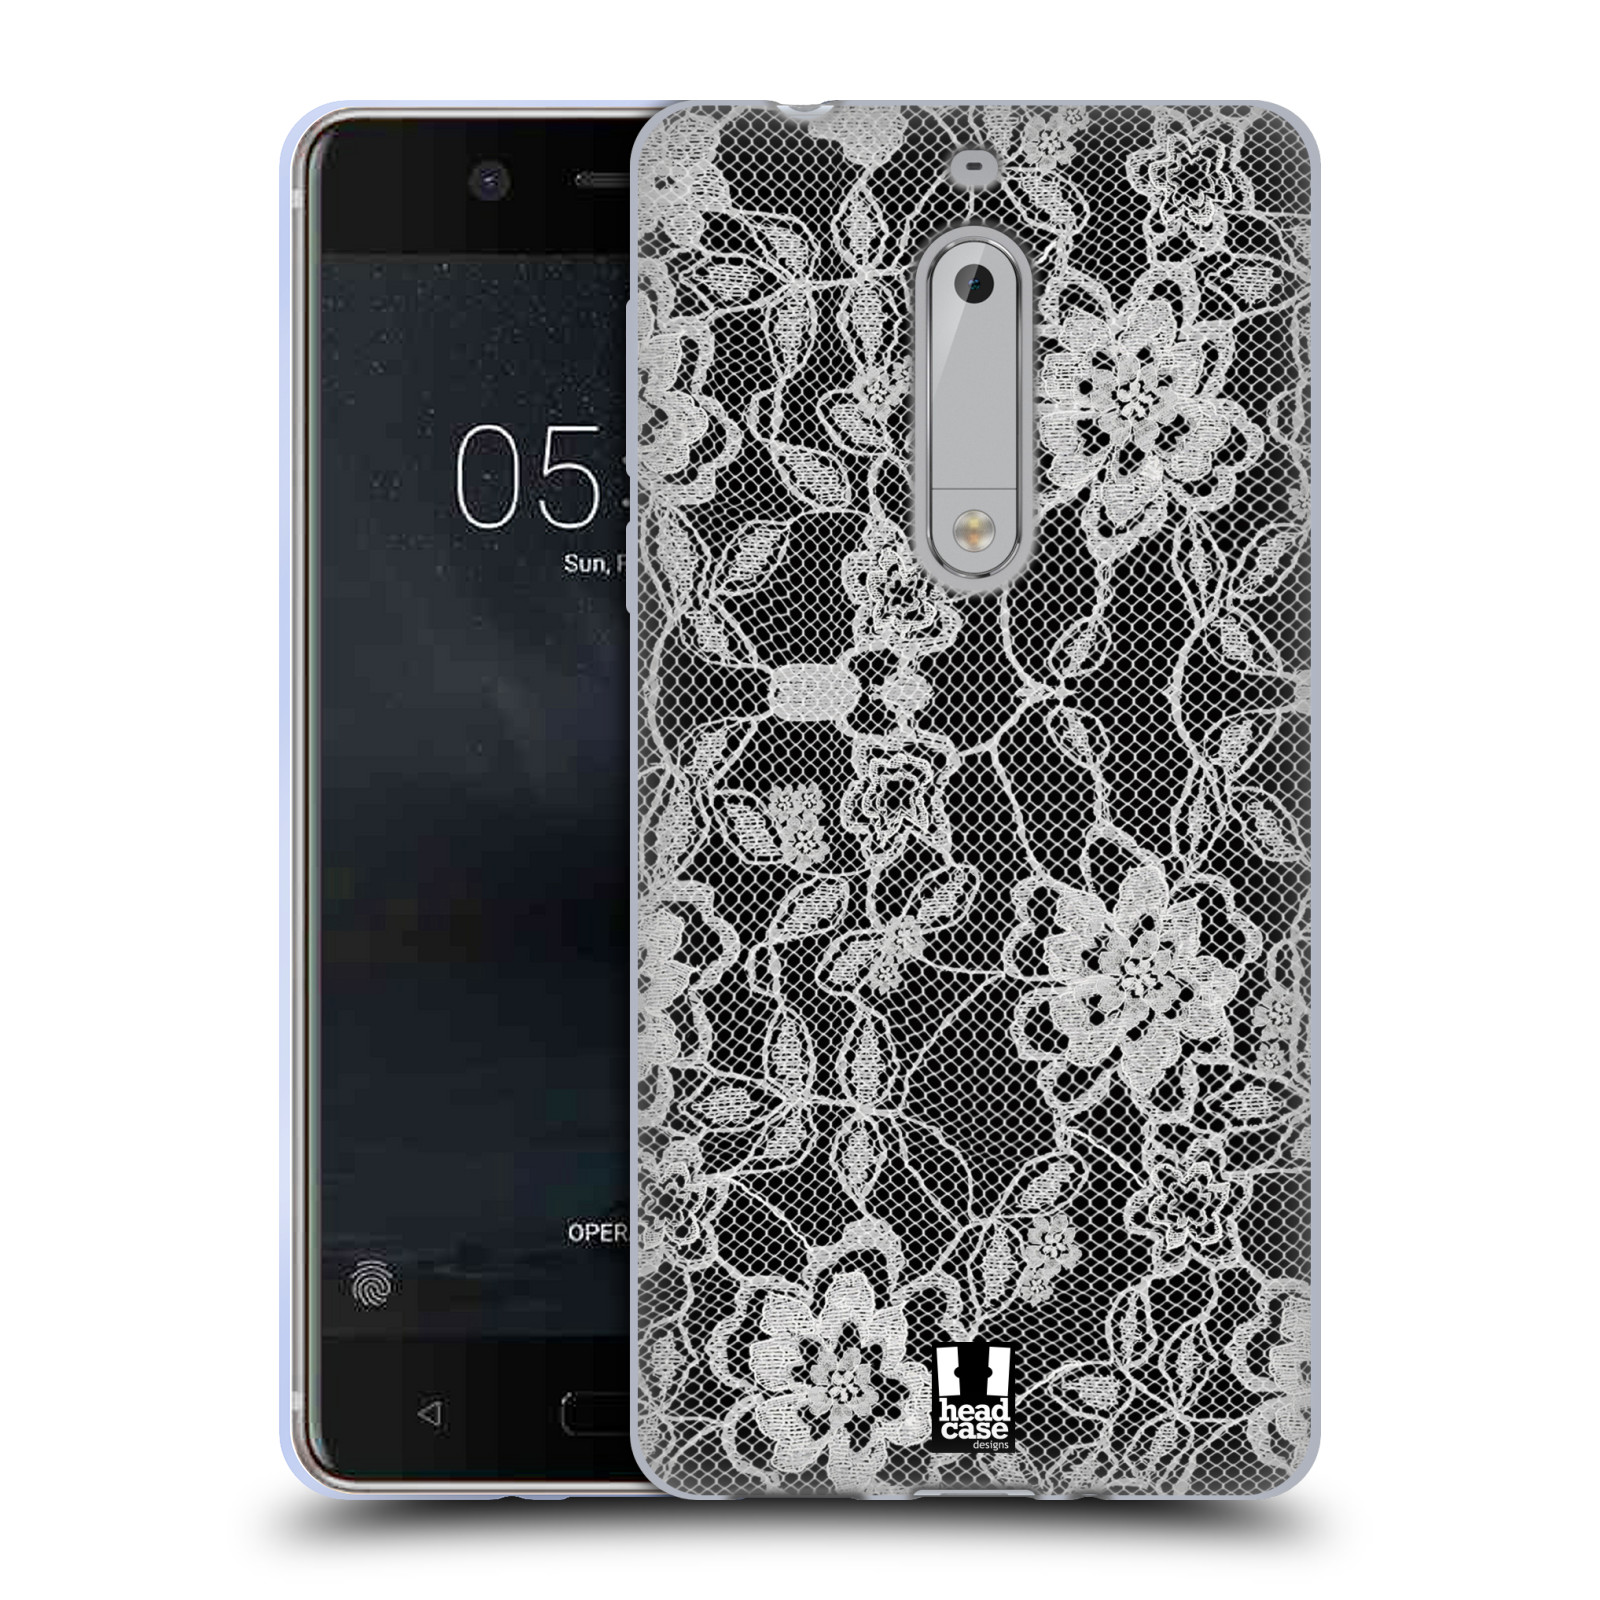 Silikonové pouzdro na mobil Nokia 5 Head Case - FLOWERY KRAJKA